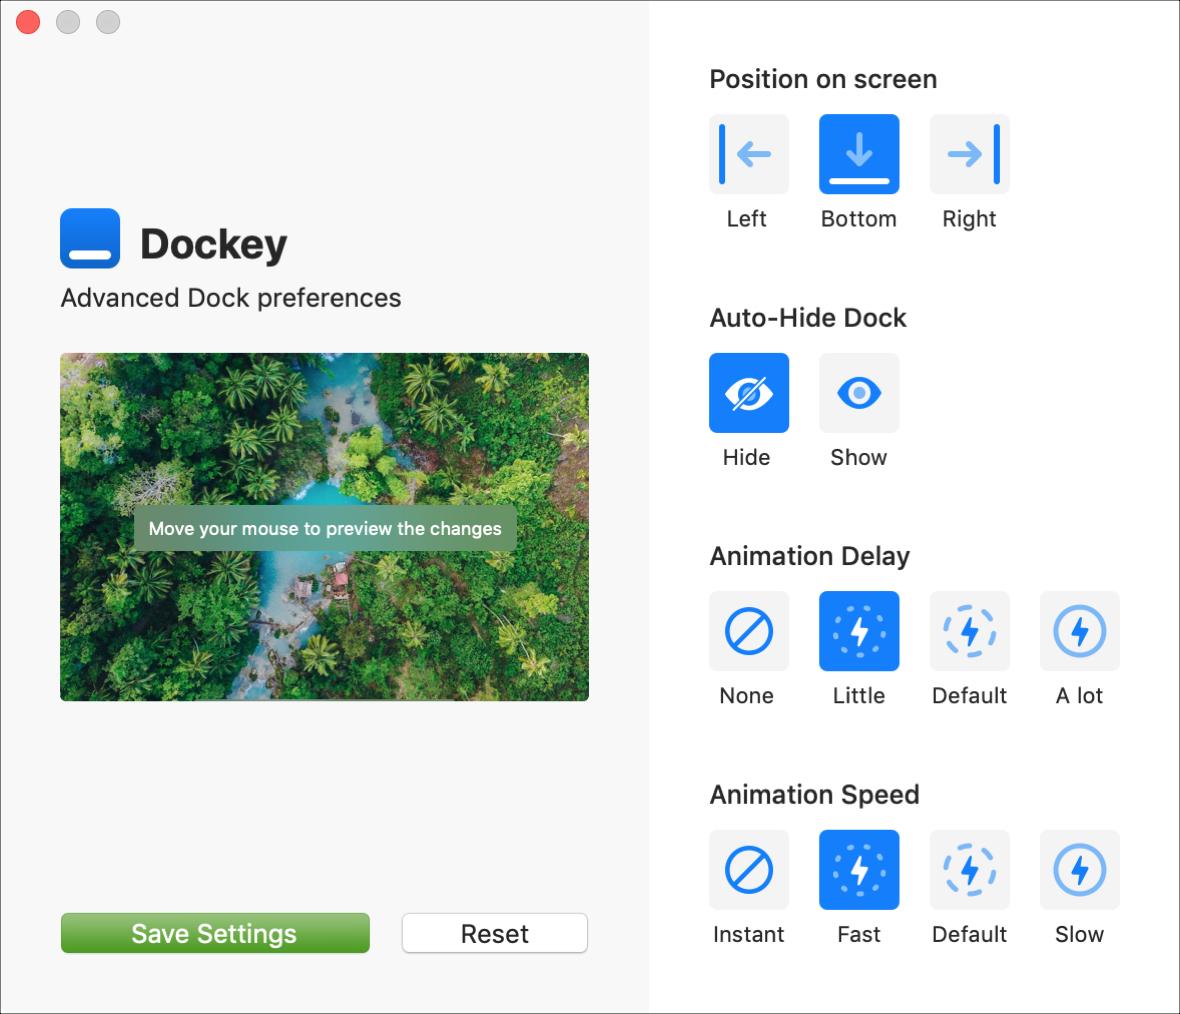 Dockey App Interface Mac